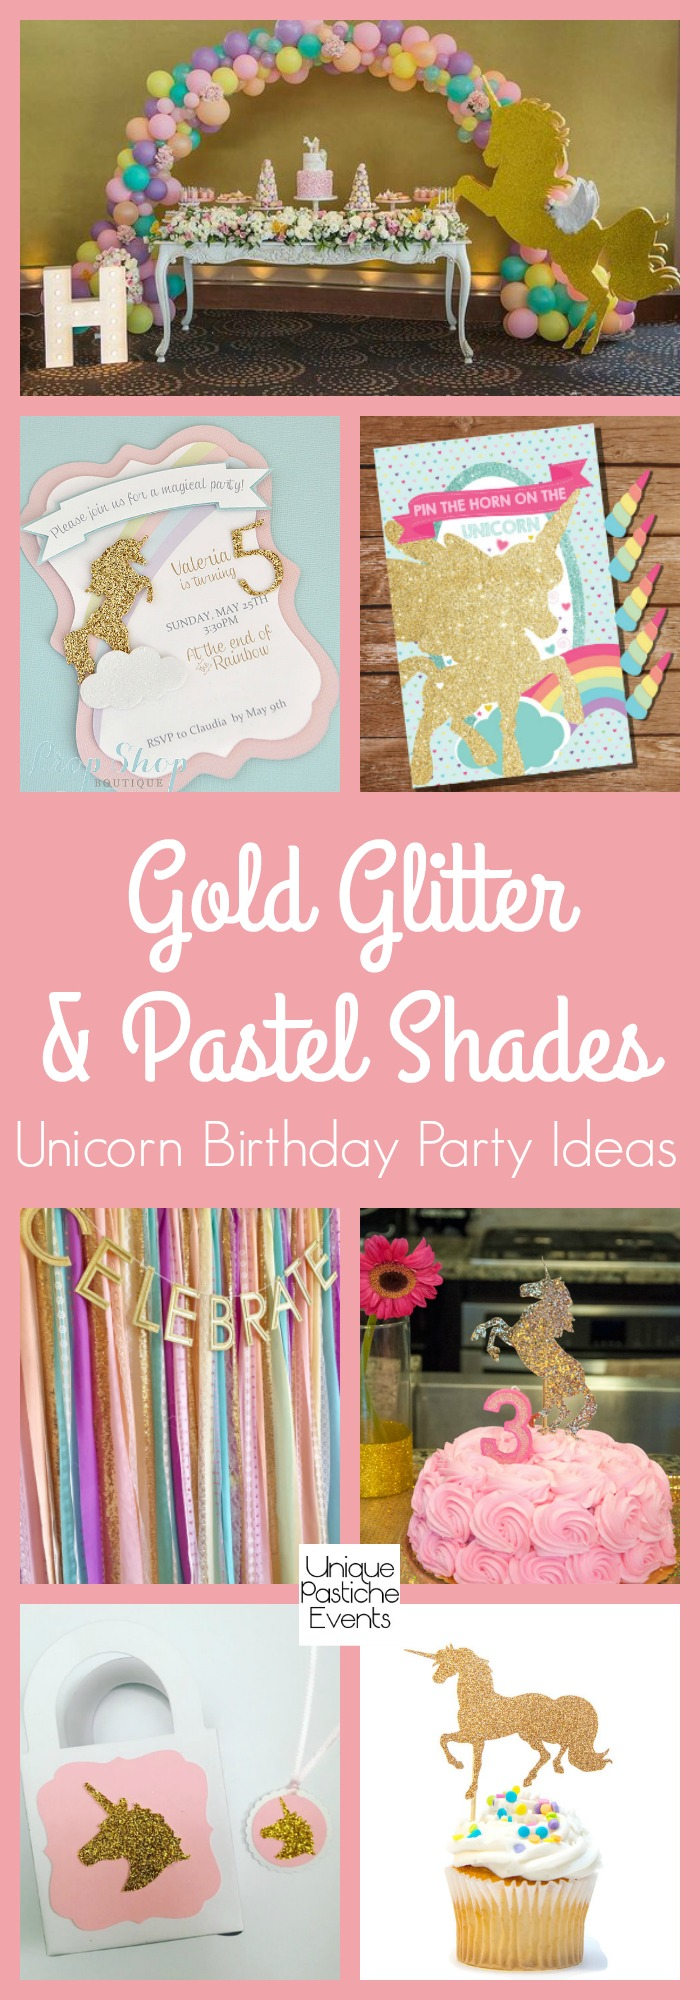 Gold Glitter and Pastel Shades Unicorn Birthday Party Ideas